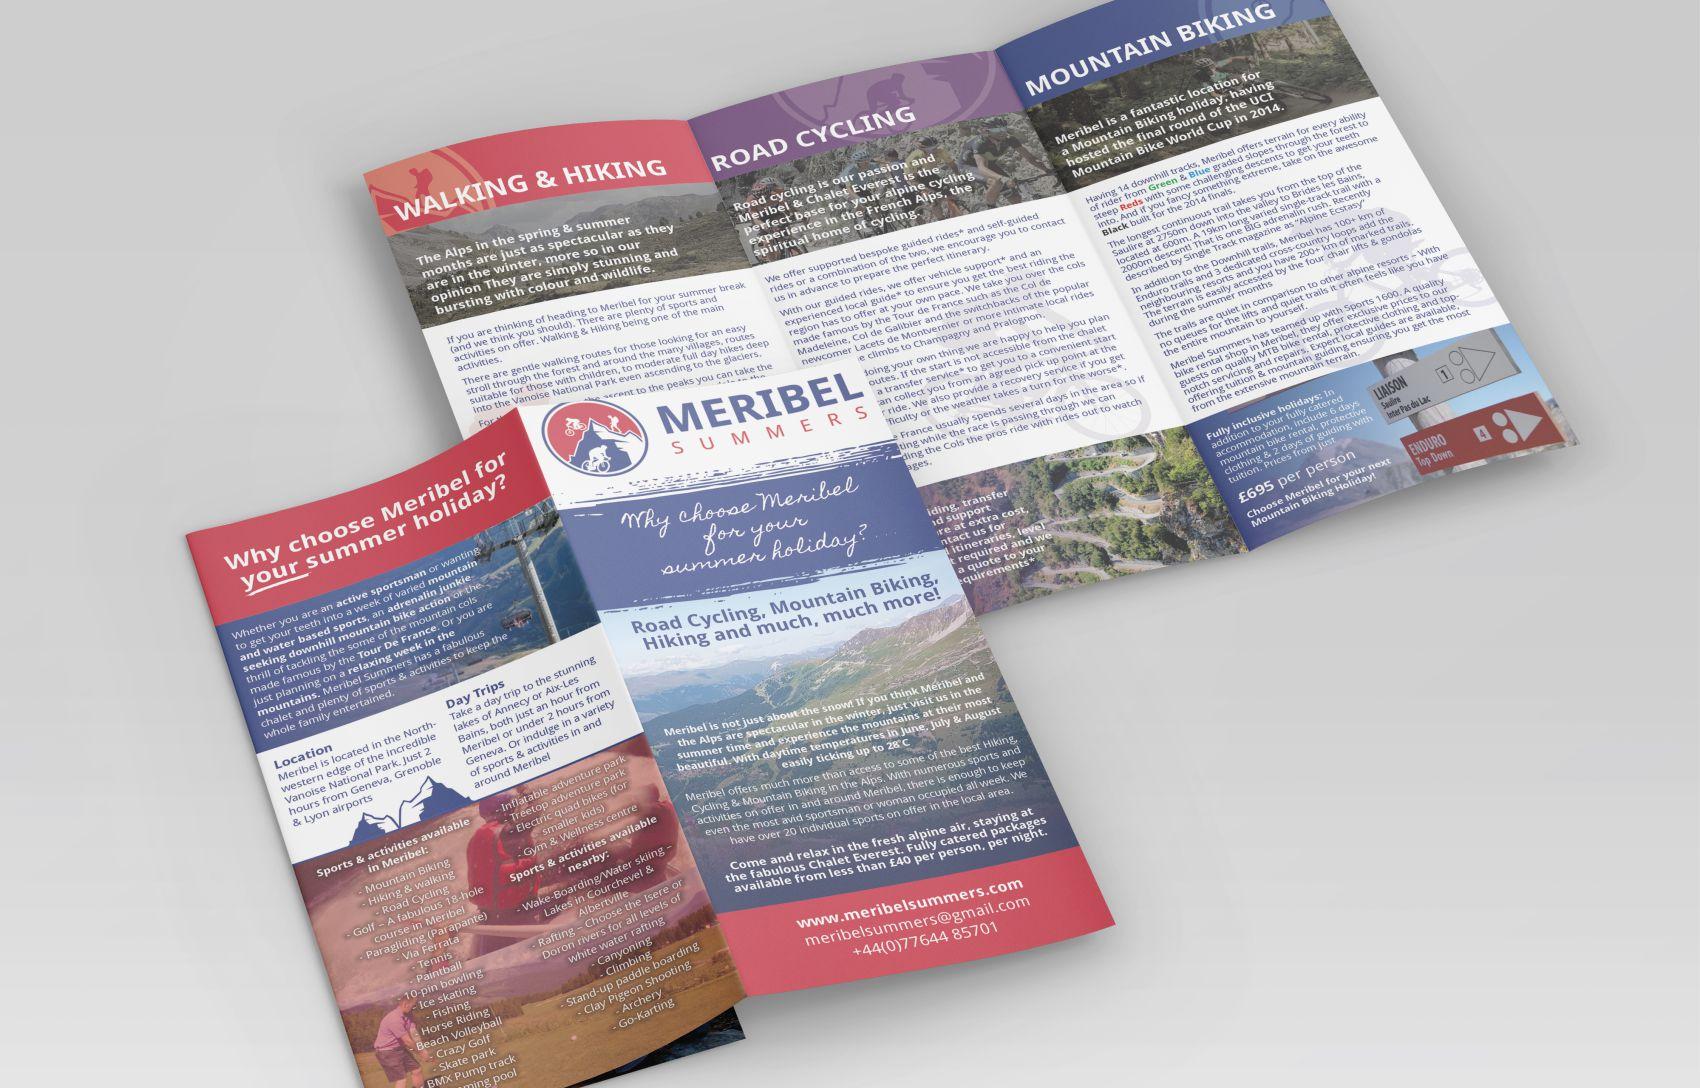 Folded-Leaflet-Mockup-Meribel